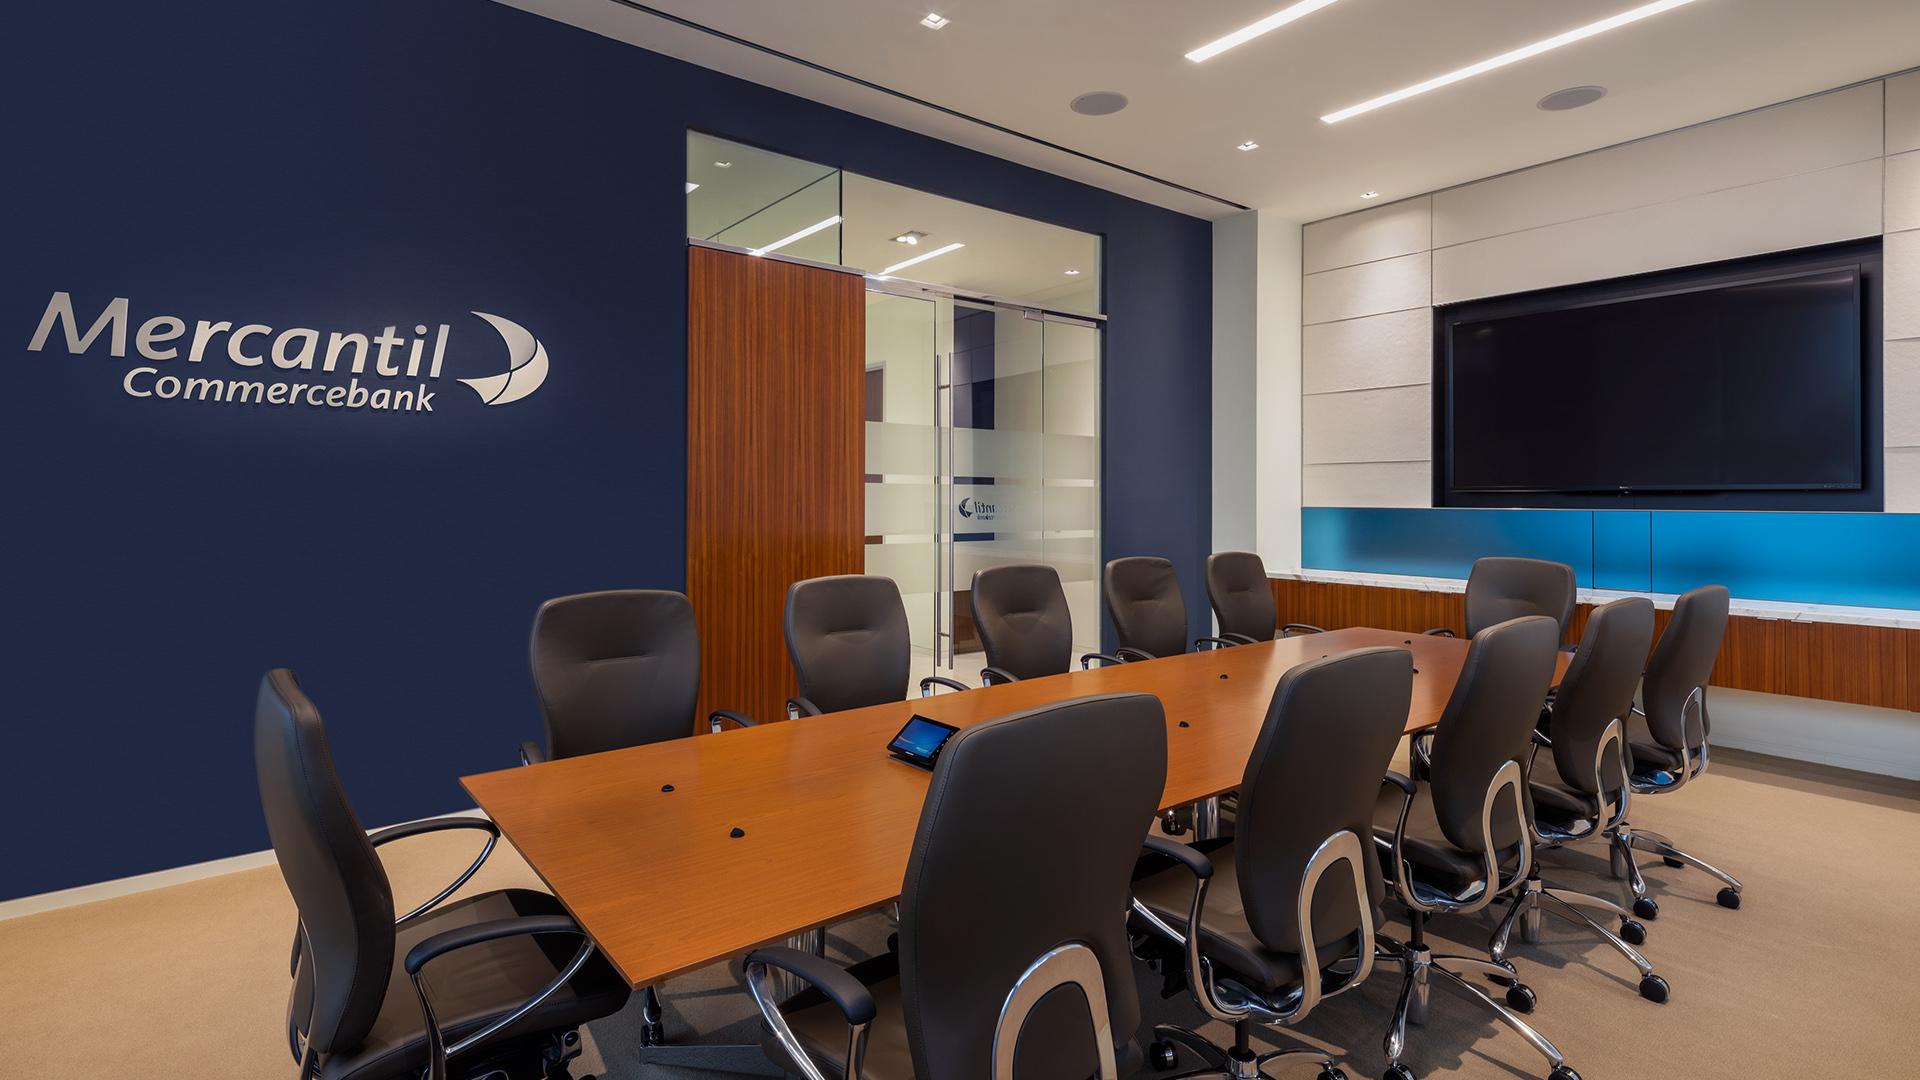 Financial Retail Interior Design Mercantil Commercebank Champions Louetta Conference Room